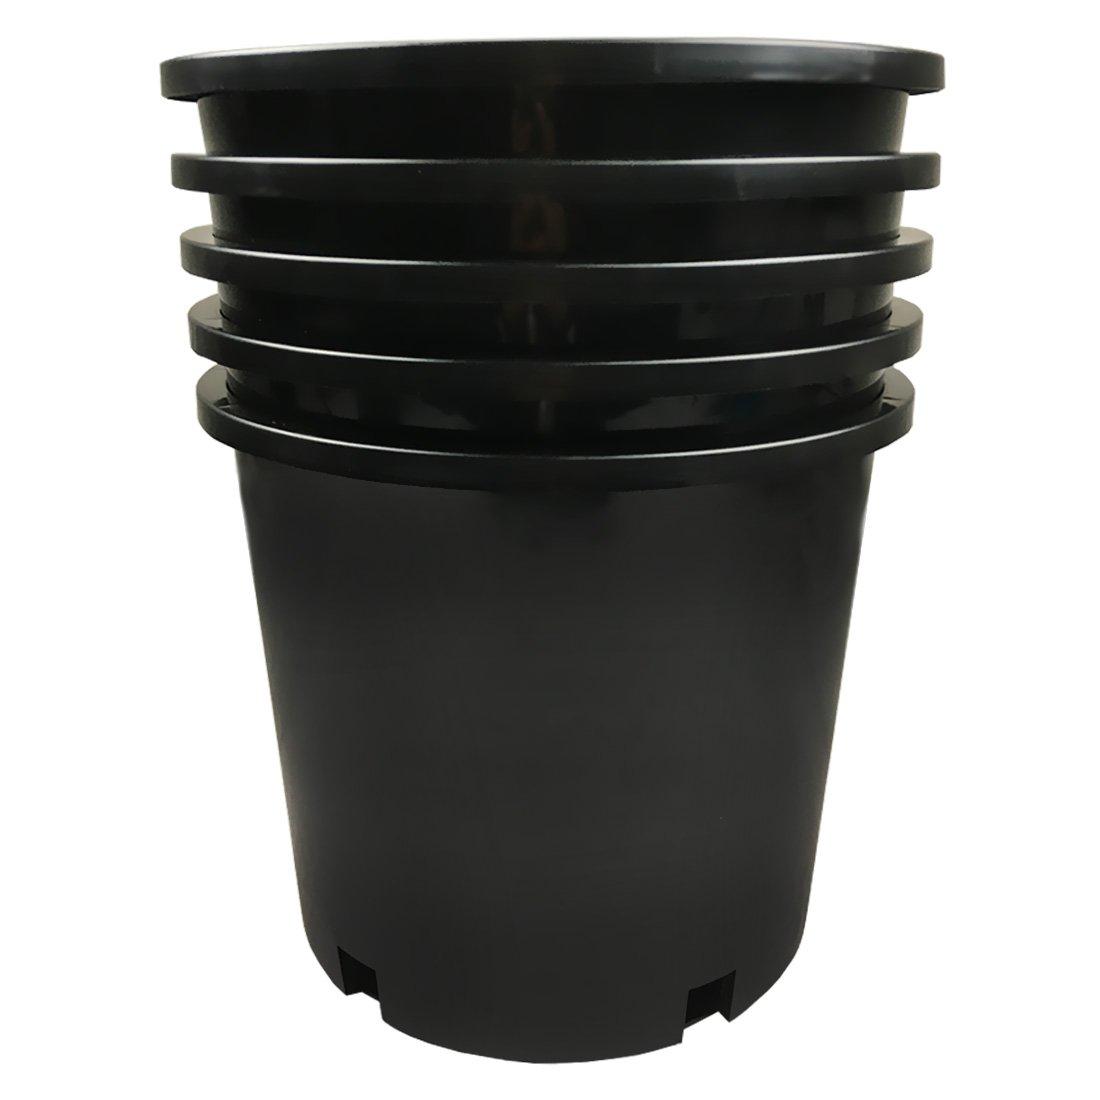 Calipots 5-Pack 5 Gallon Premium Black Plastic Nursery Plant Container Garden Planter Pots (5 Gallon)